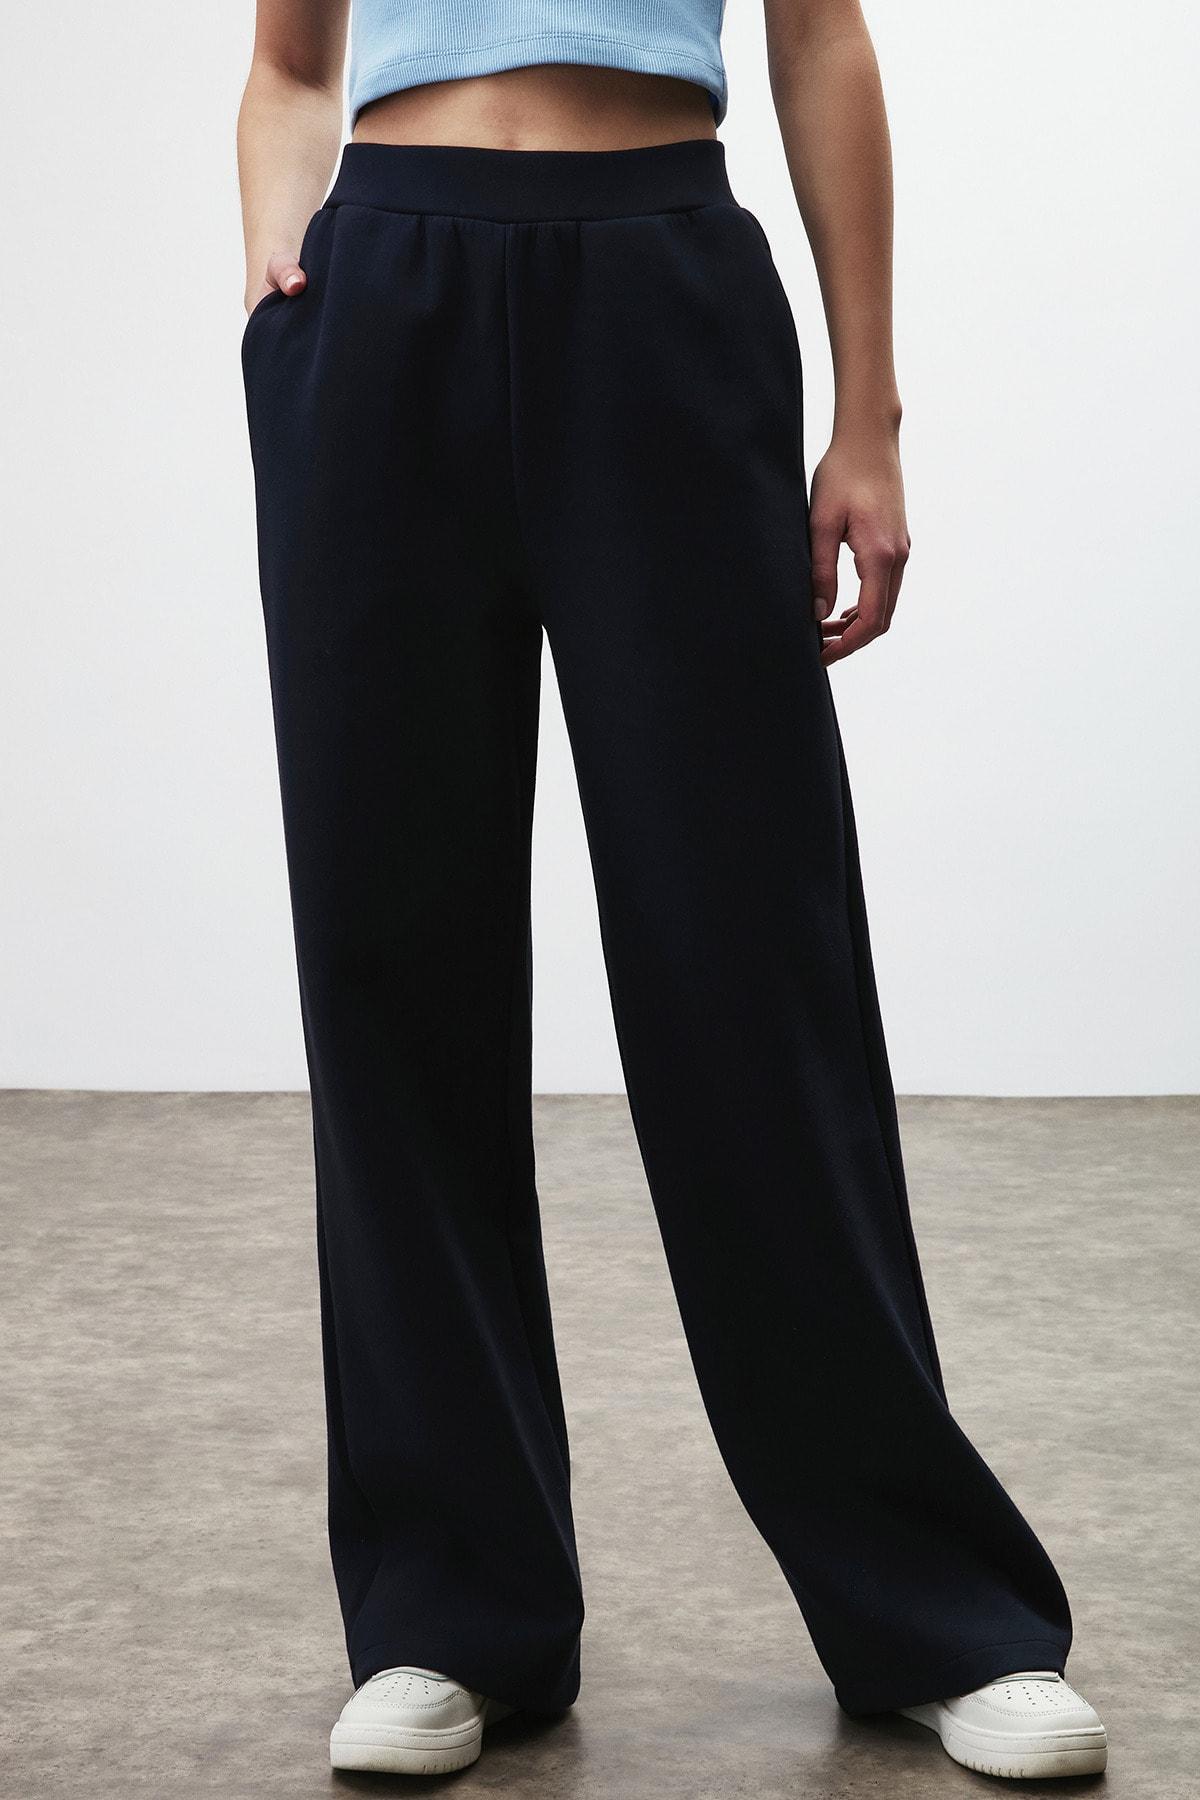 LEILA Kadın Siyah Bol Kesim Pantolon